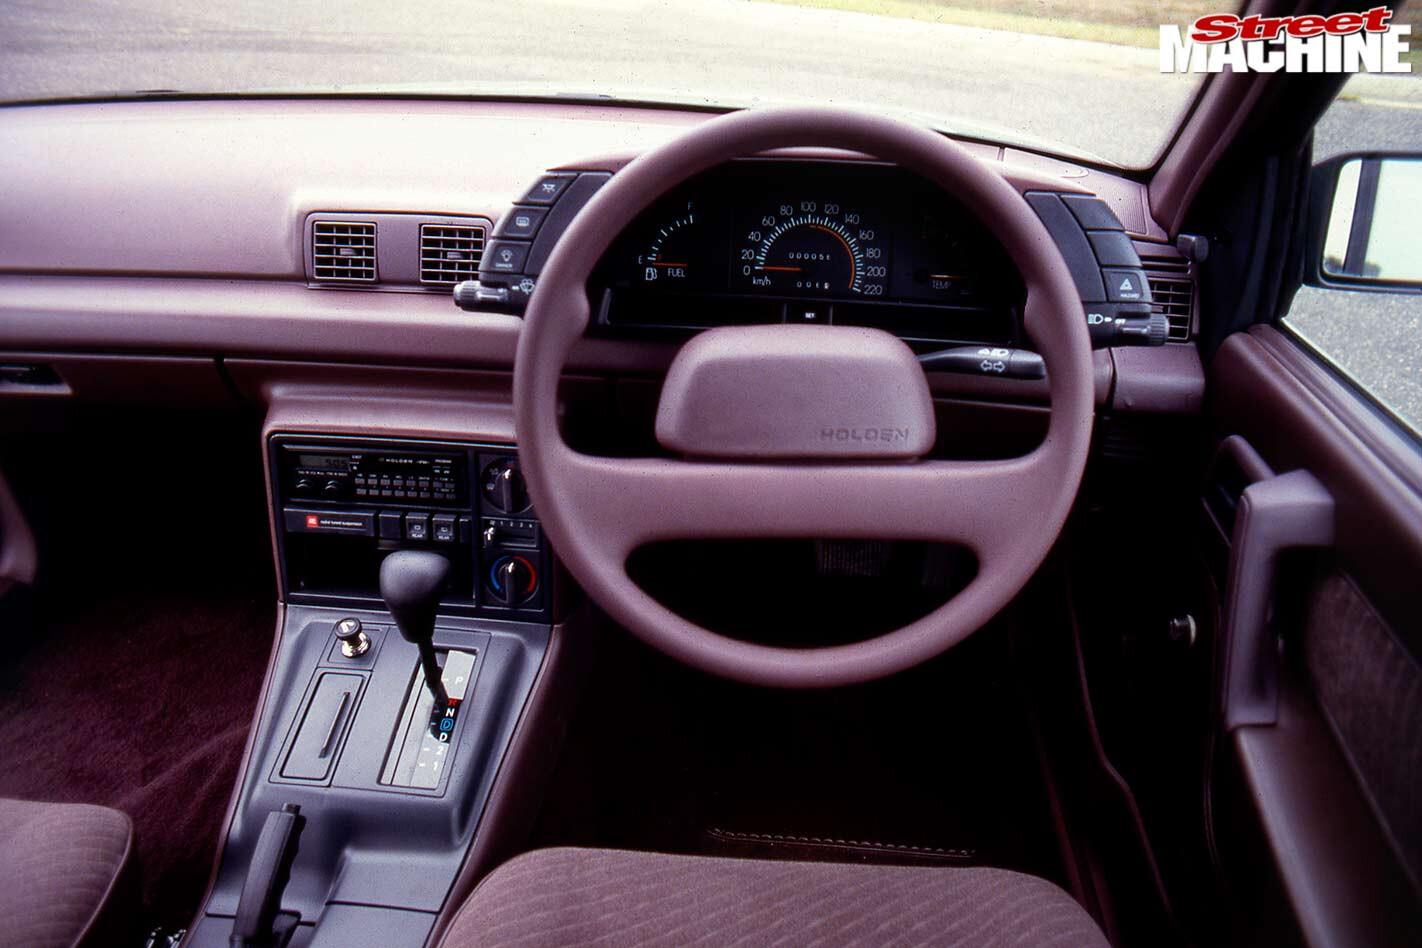 Holden Commodore VN dash